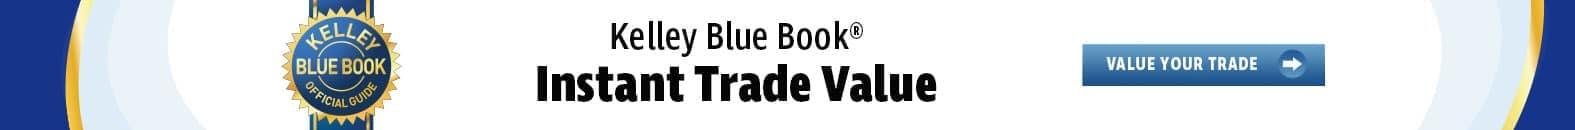 Kelley Blue Book Instant Trade Value - Bert Ogden Harlingen Kia in Harlingen, Texas